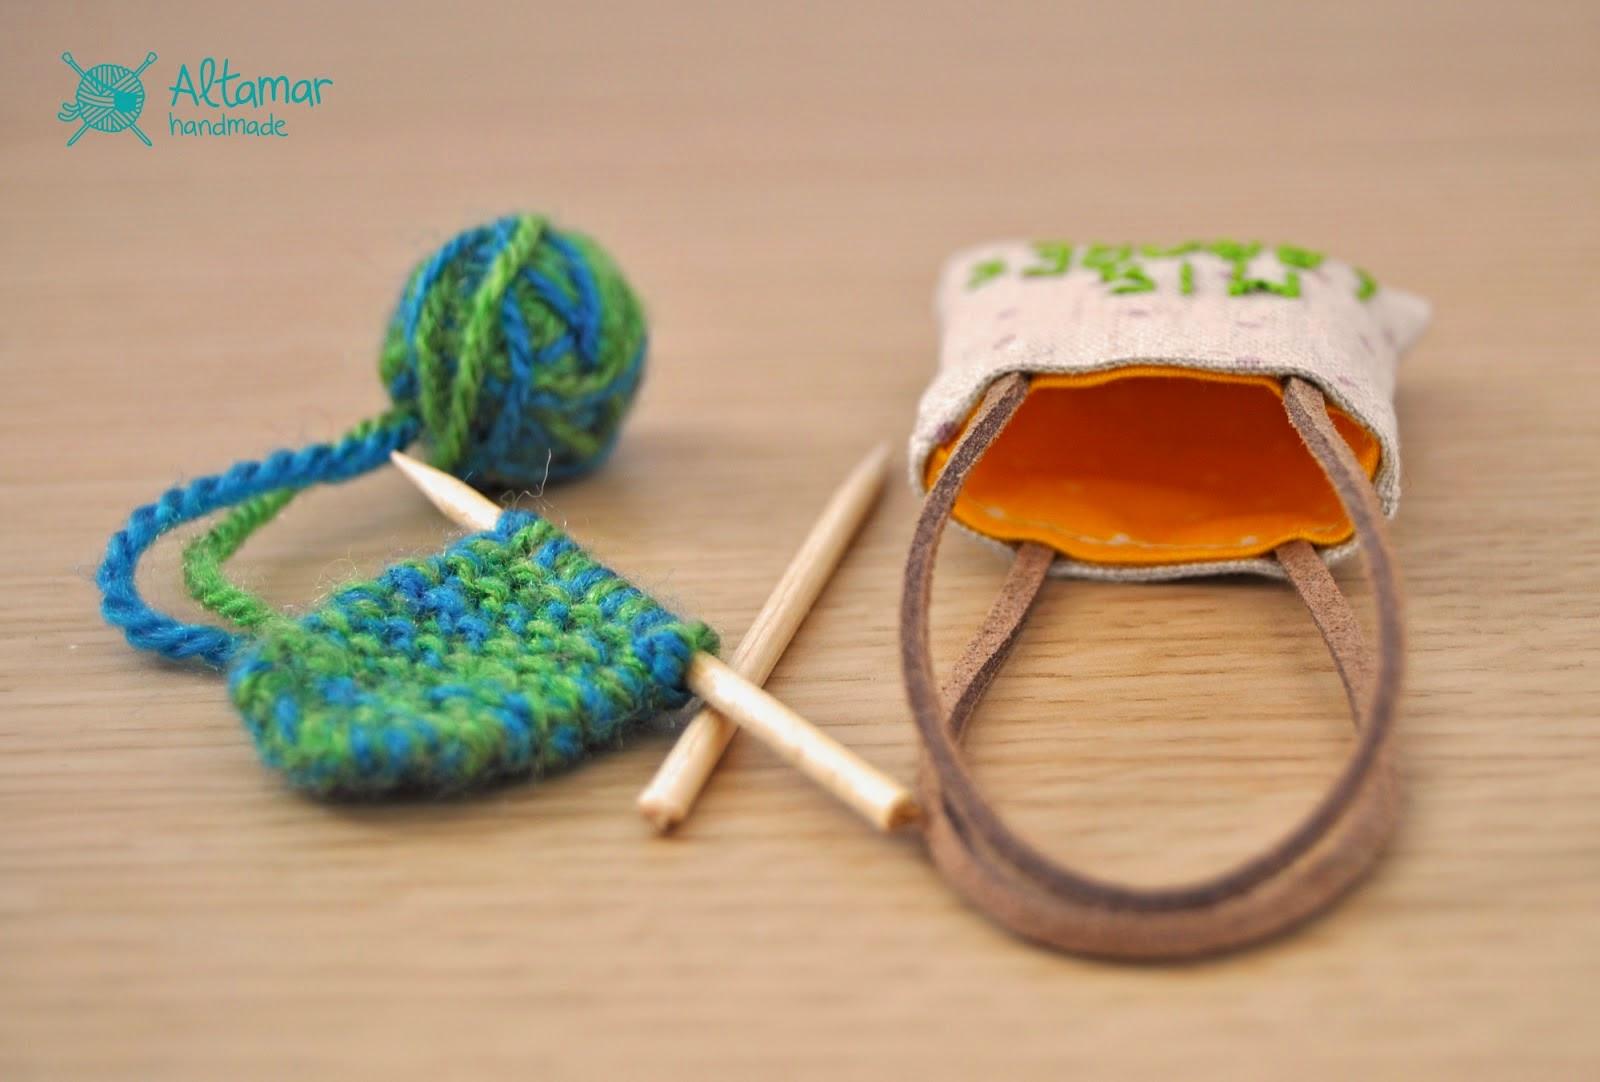 Altamar Handmade